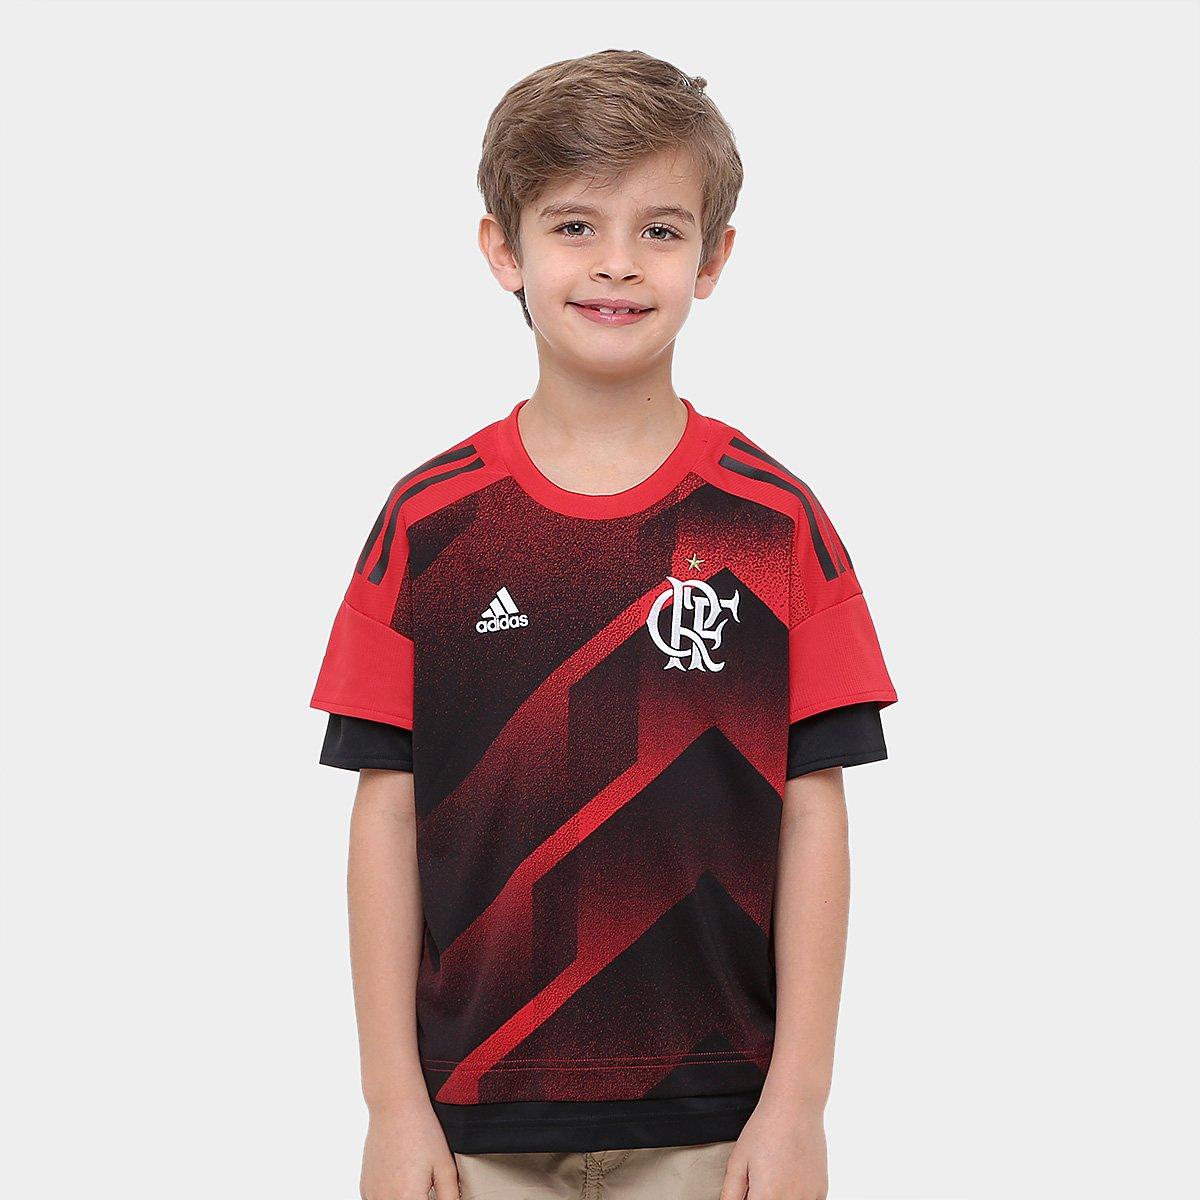 428f7a27b8 Camisa Flamengo Infantil Goleiro I 17 18 Torcedor Adidas Masculina ...